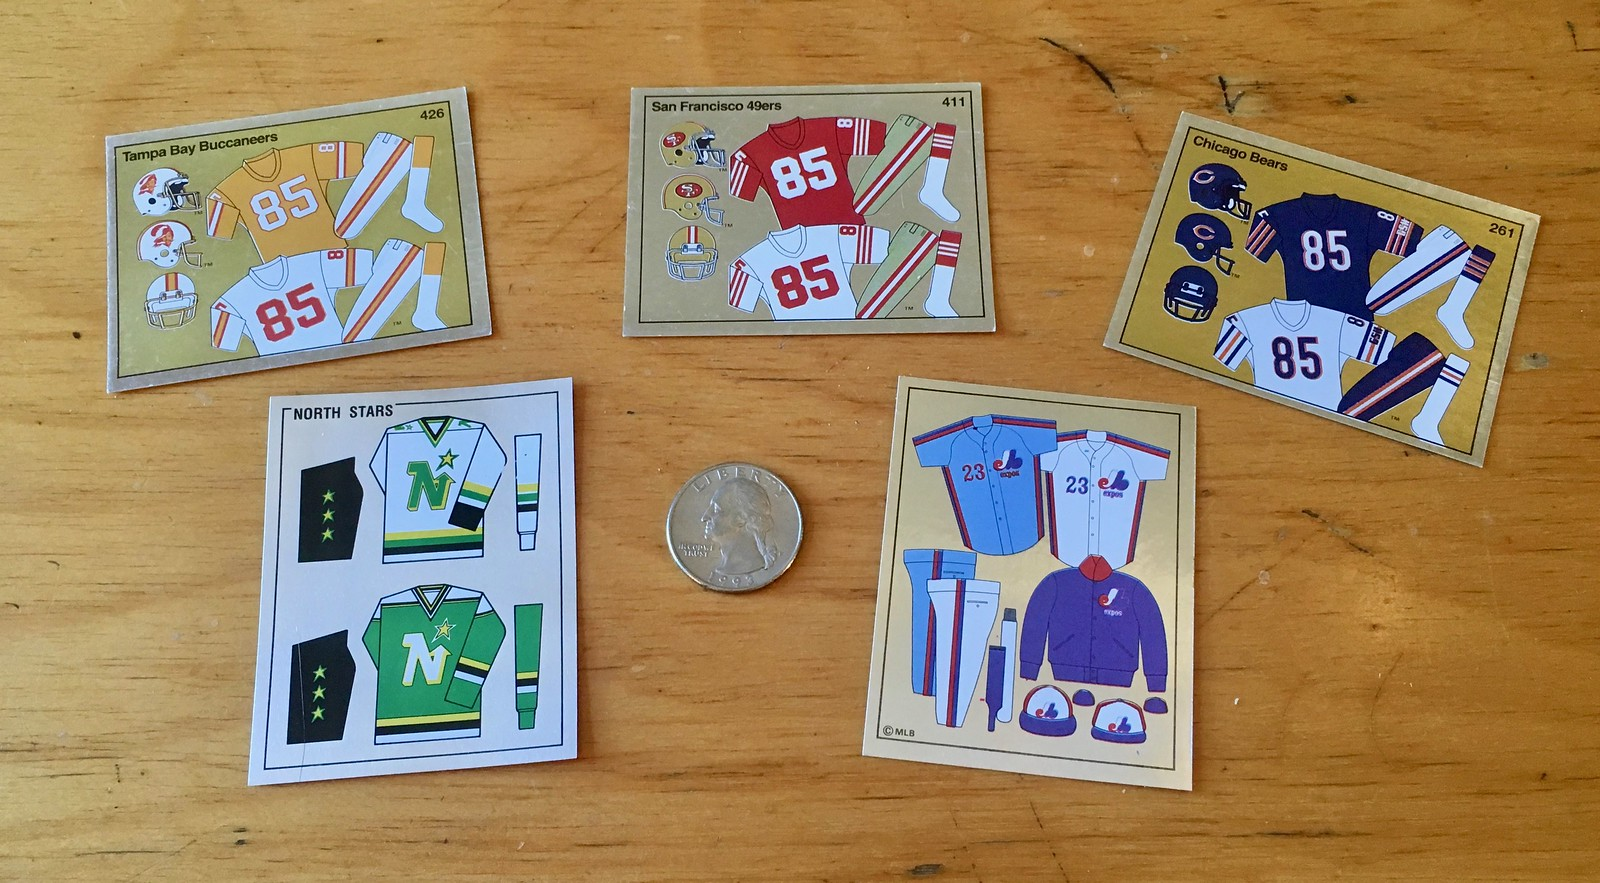 Major Vintage Find Pro Sports Uniform Trading Stickers Uni Watch